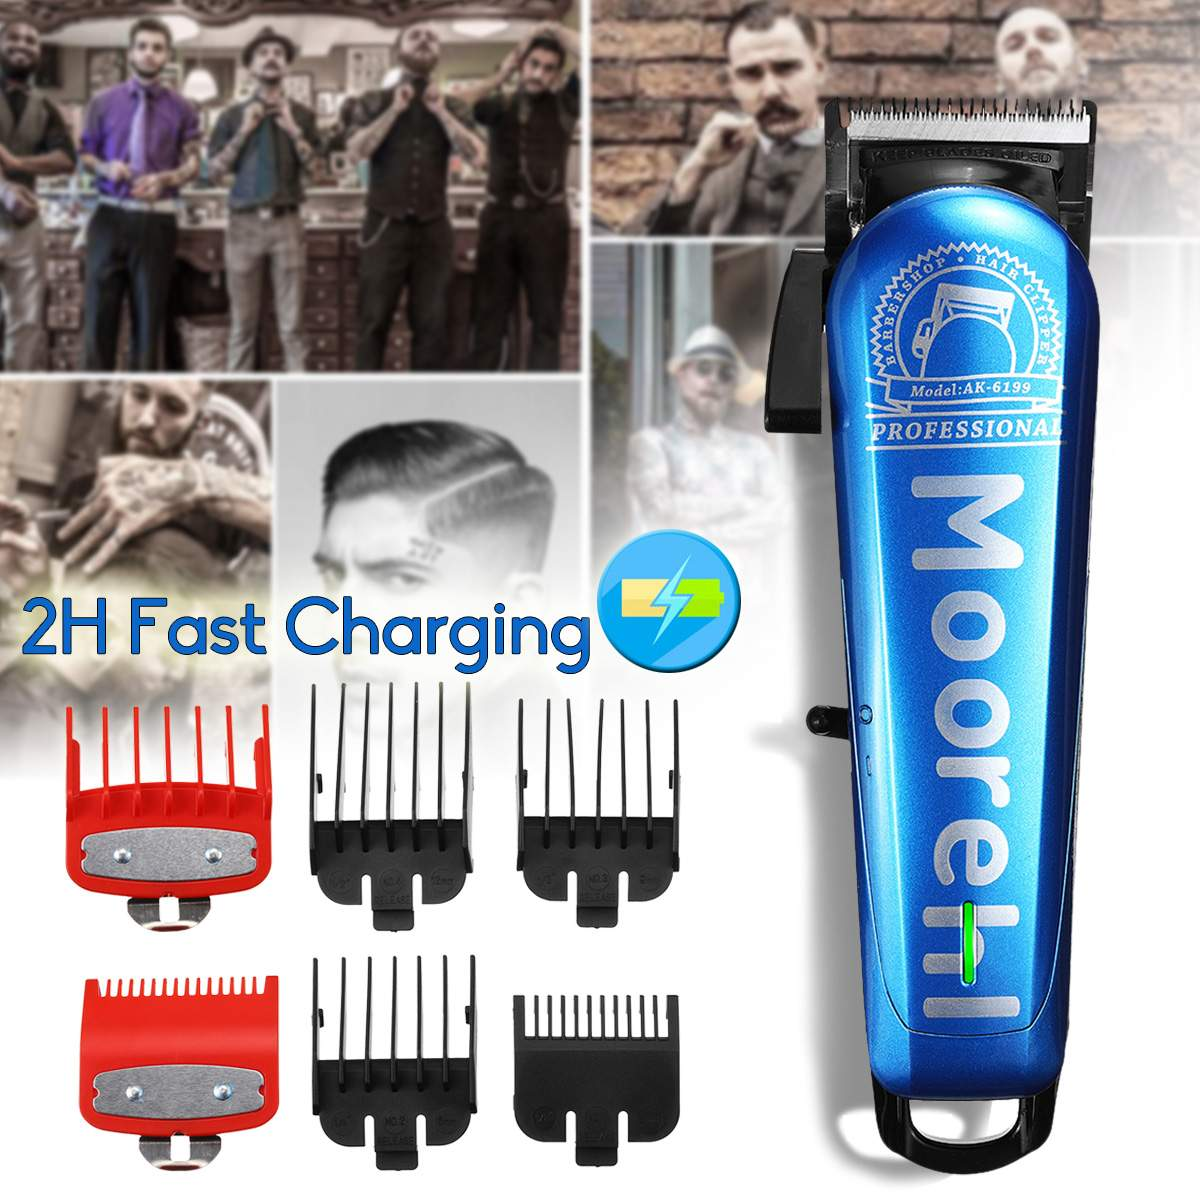 Baorun Professional Hair Trimmer Electric Precisions 0mm Hair Clipper Cutting 2H Fast Charging Shaving Machine Home Barber Tool